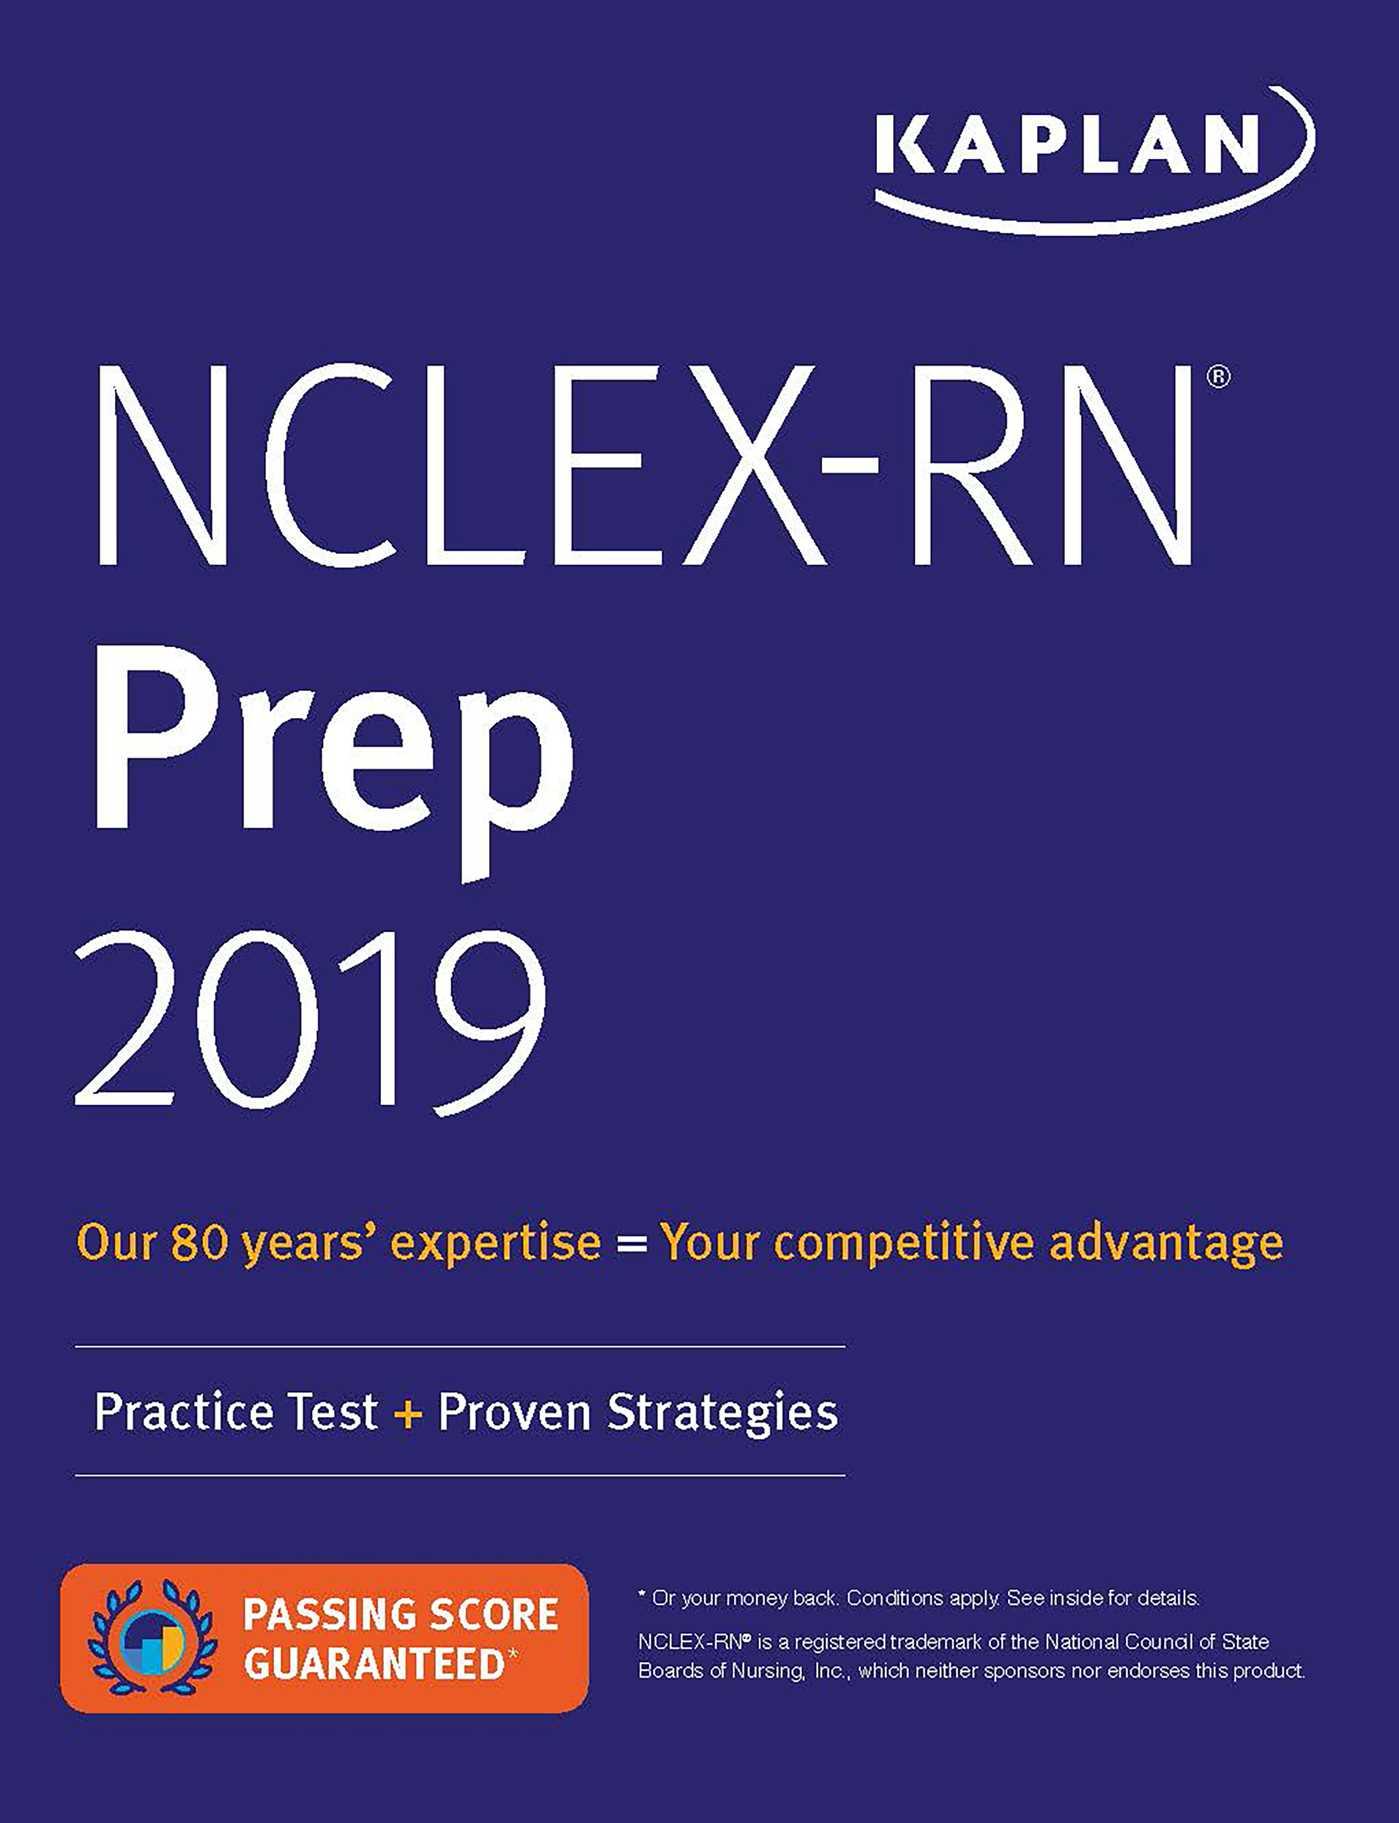 NCLEX-RN Prep 2019 | Book by Kaplan Nursing | Official